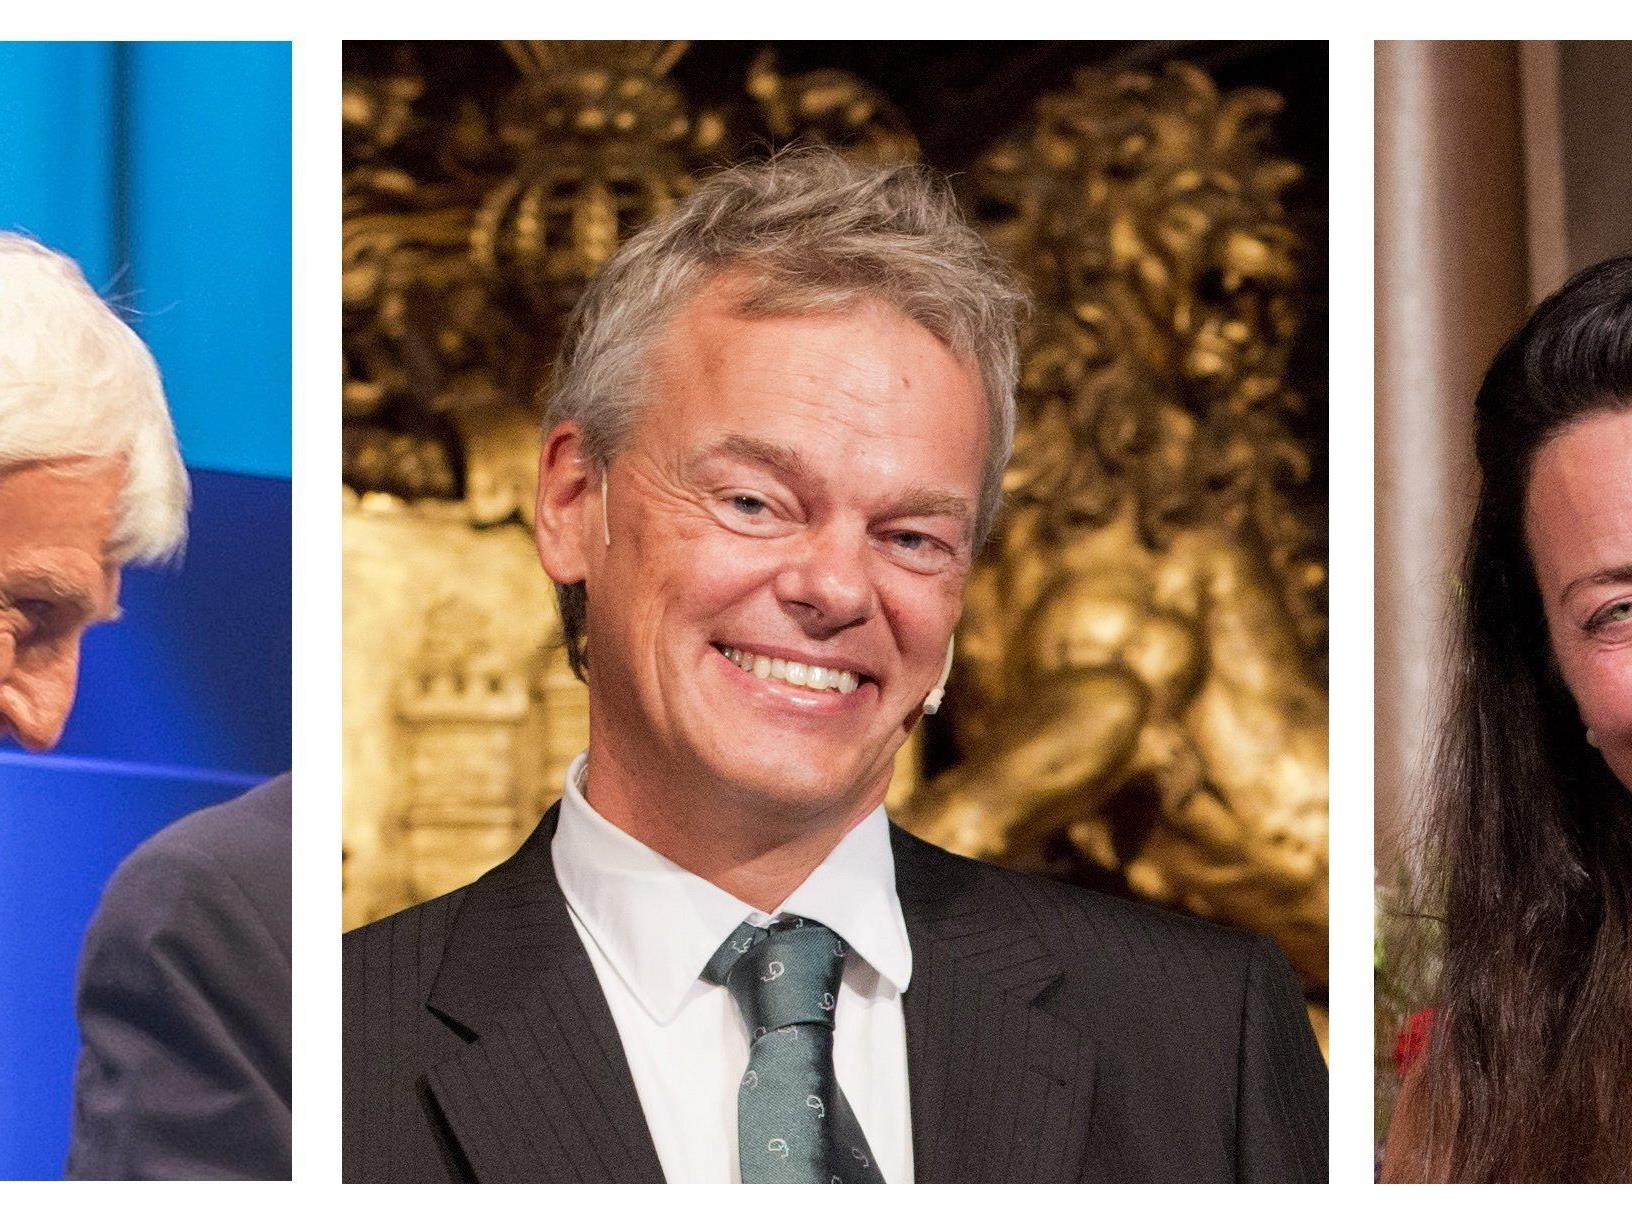 Medizin-Nobelpreis 2014 an John O'Keefe sowie Edvard und May-Britt Moser (v.l.).